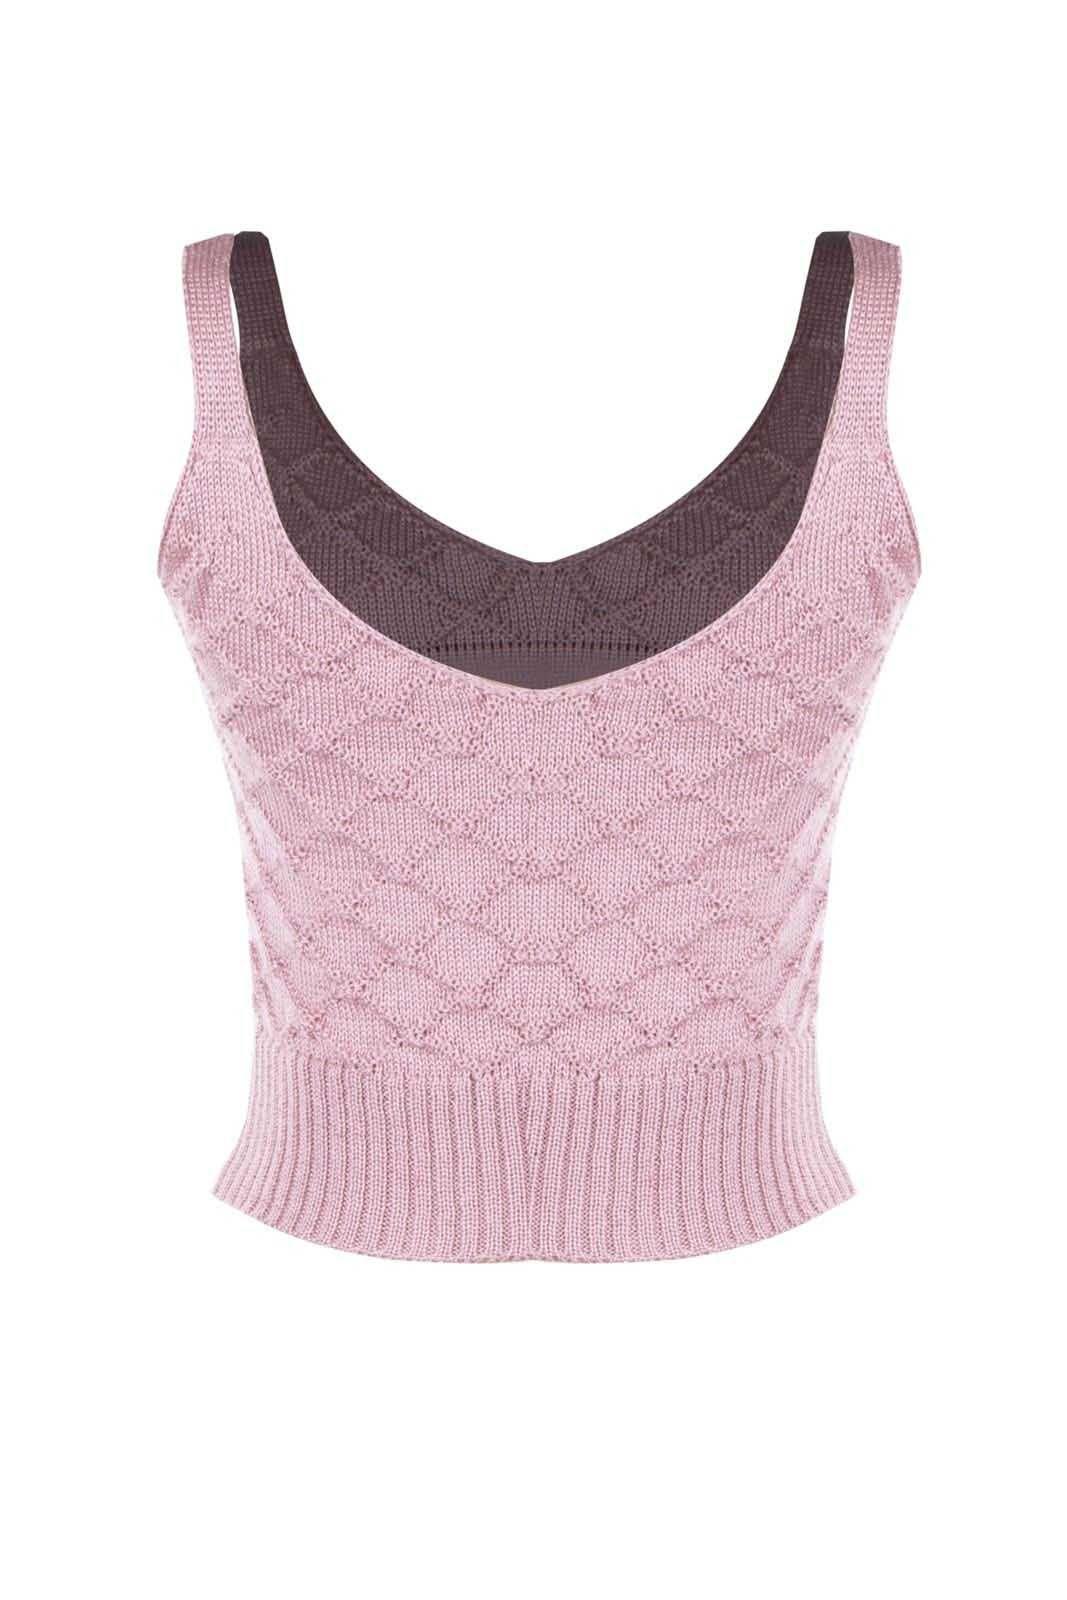 Top Outlet Dri Cropped Tricot Estampado Estampa Segue o Baile Rosê